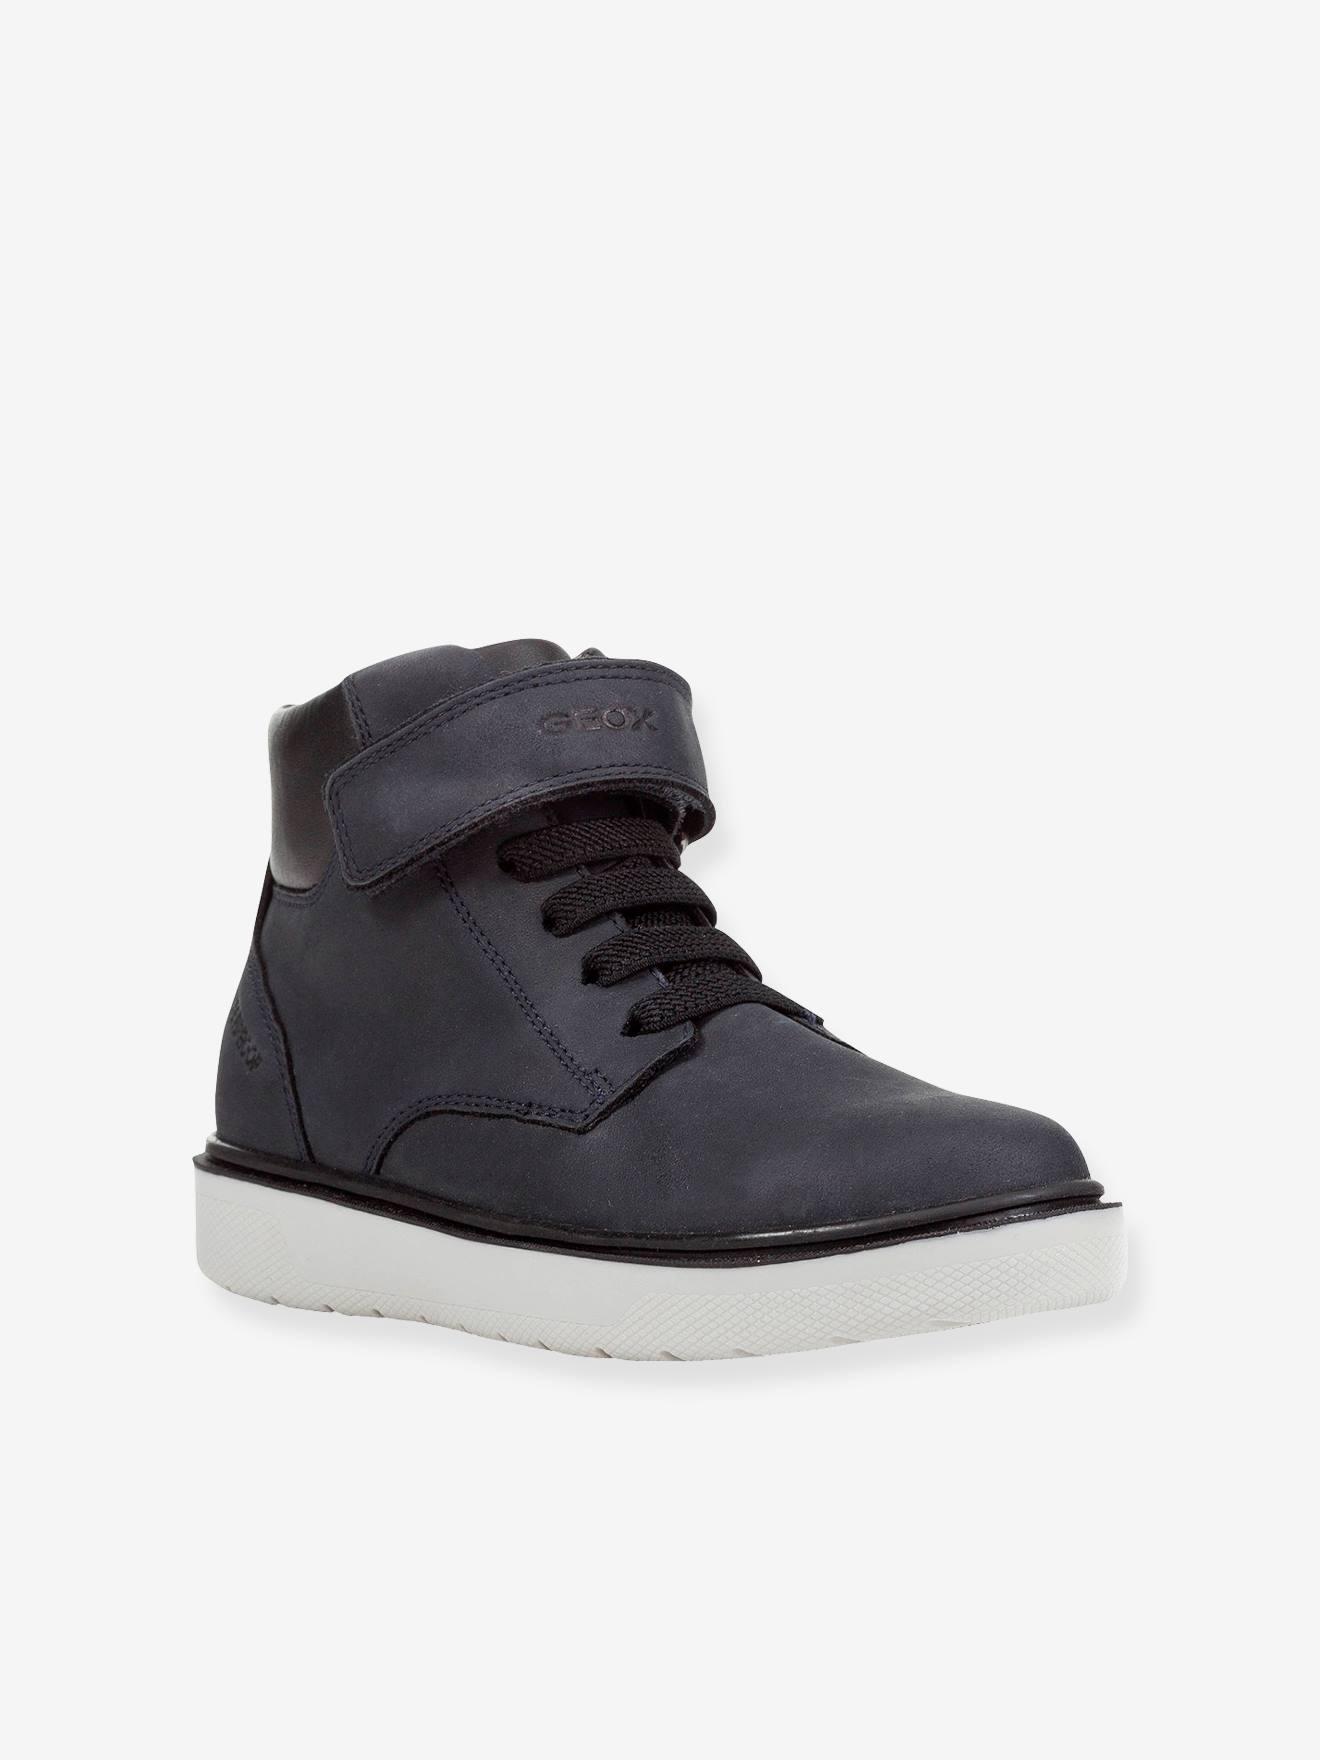 chaussures geox creil